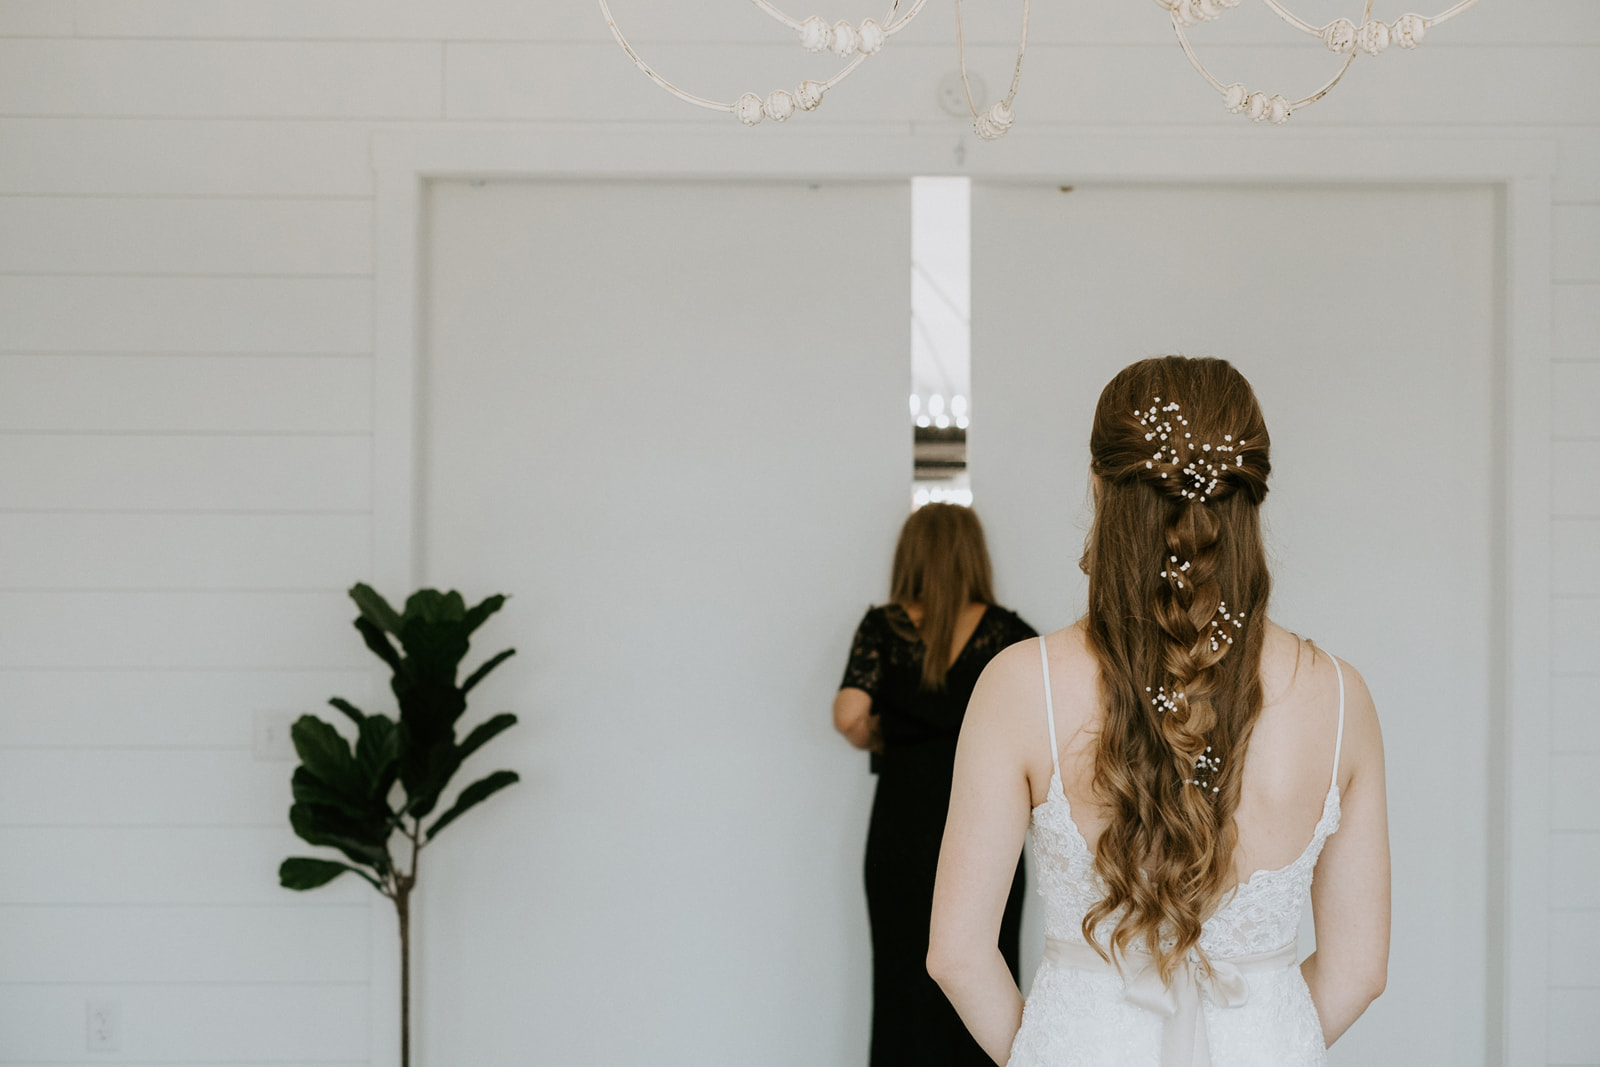 Sanburn-Wedding-Teasers-25.jpg